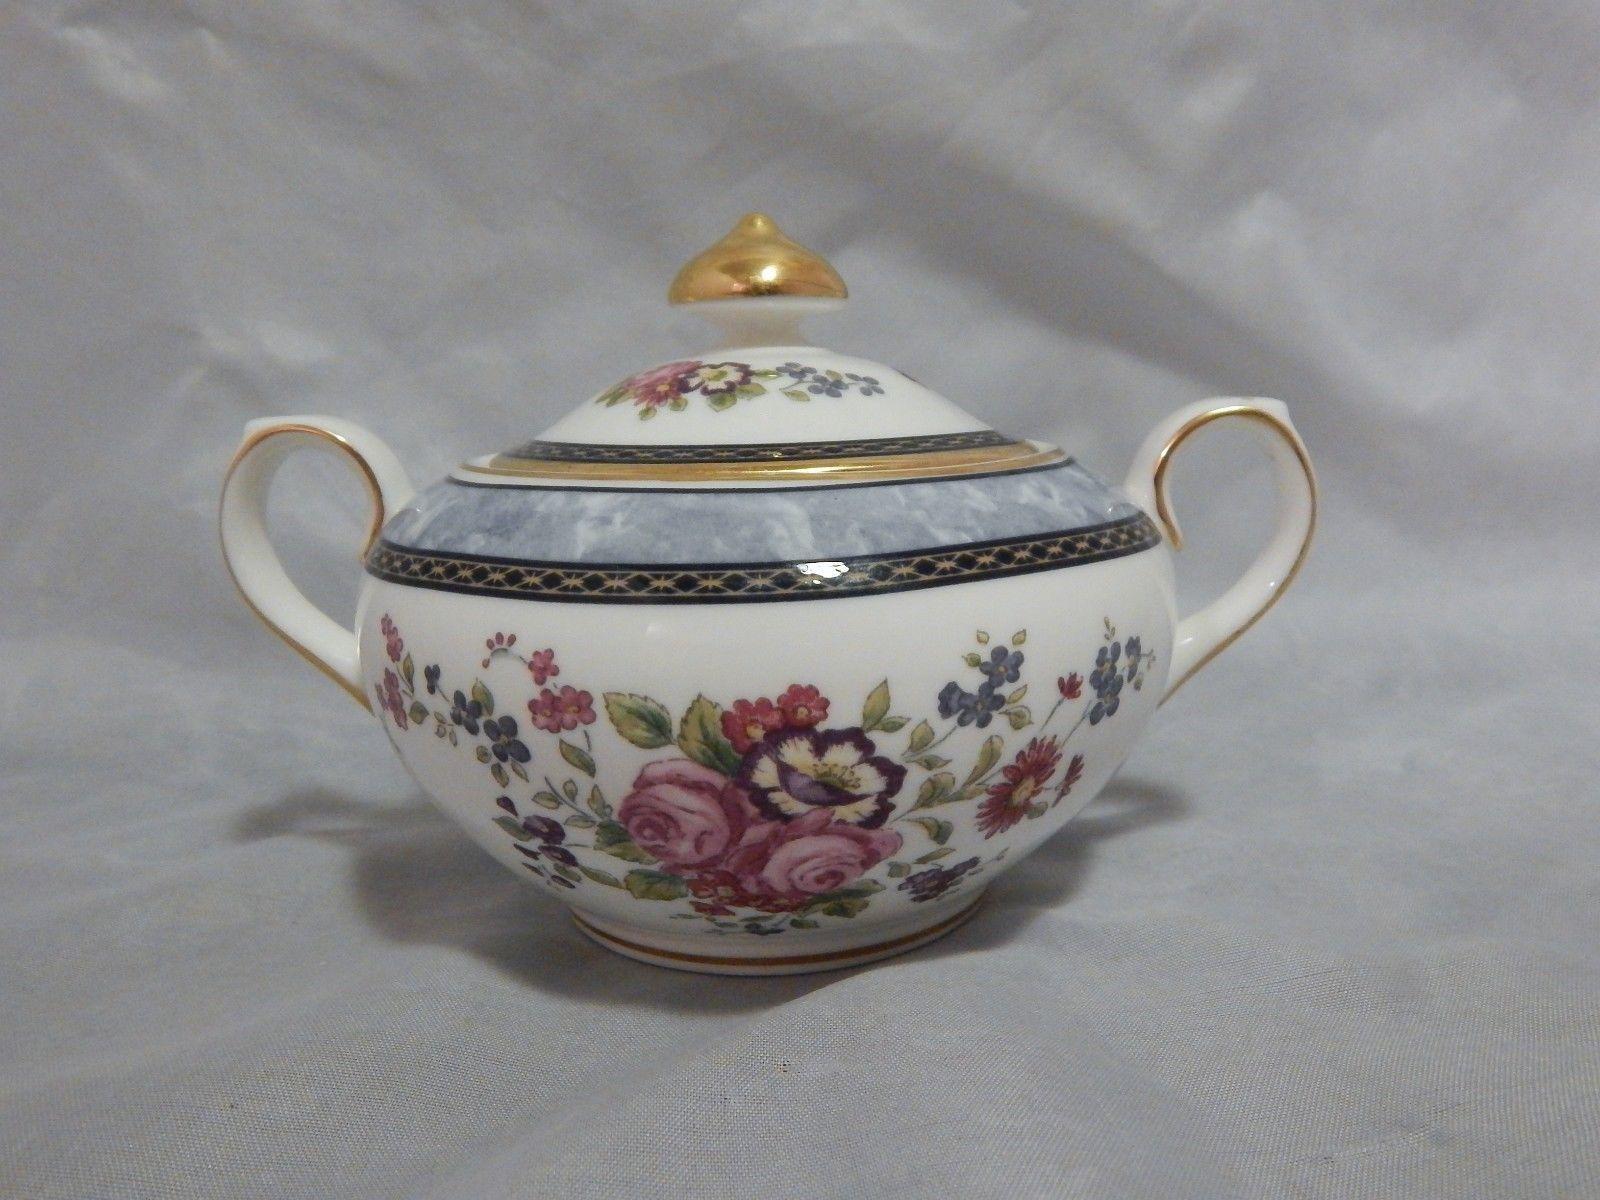 Royal Doulton Centennial Rose Covered Sugar Bowl